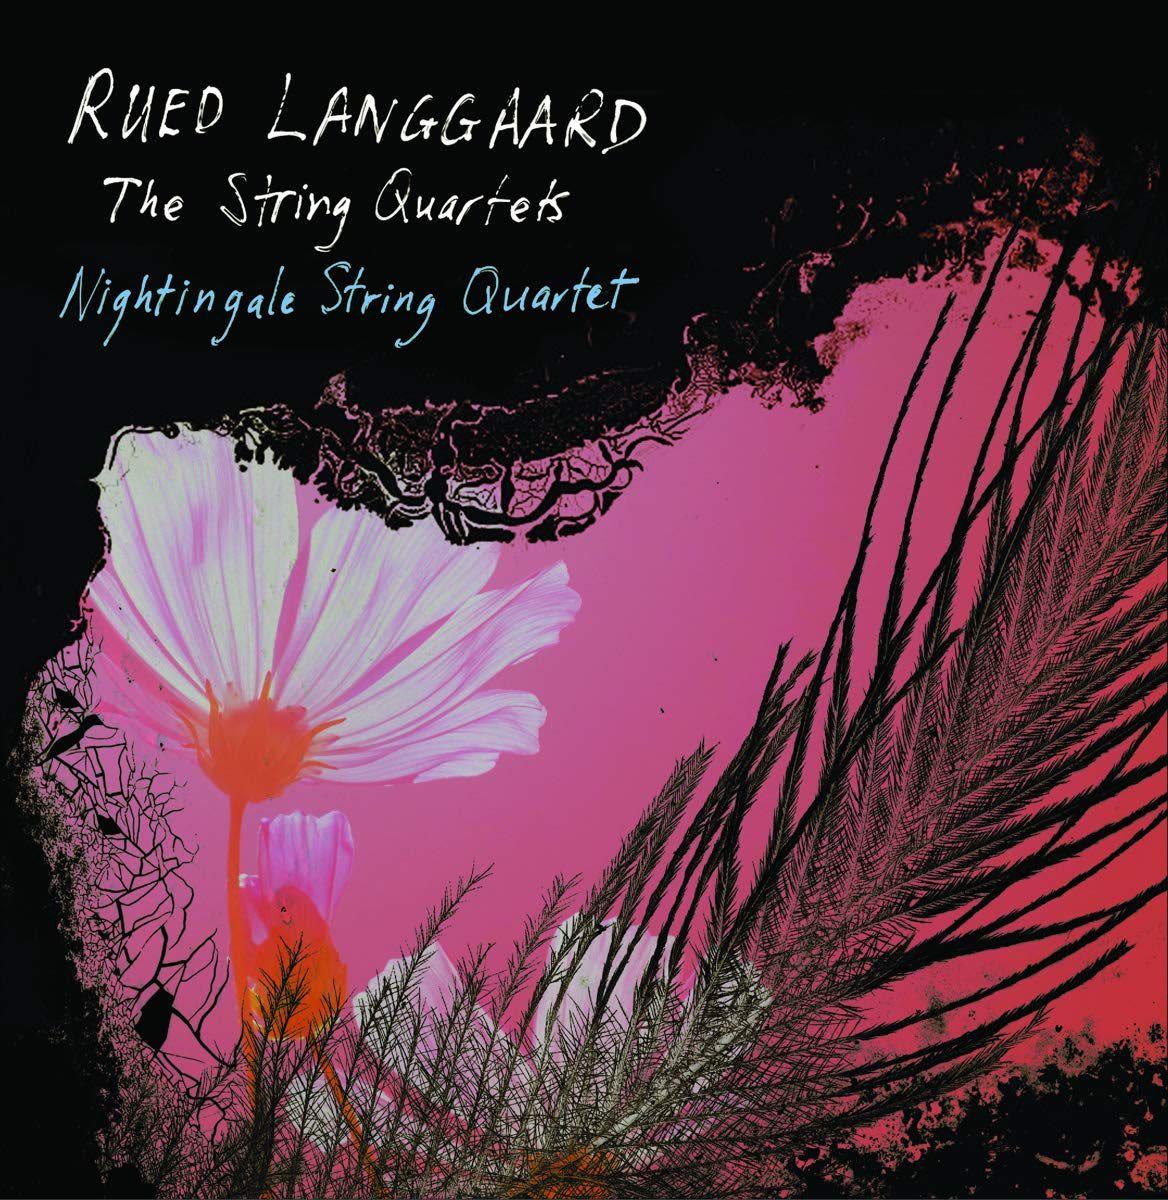 Photo No.1 of Rued Langgaard: The String Quartets